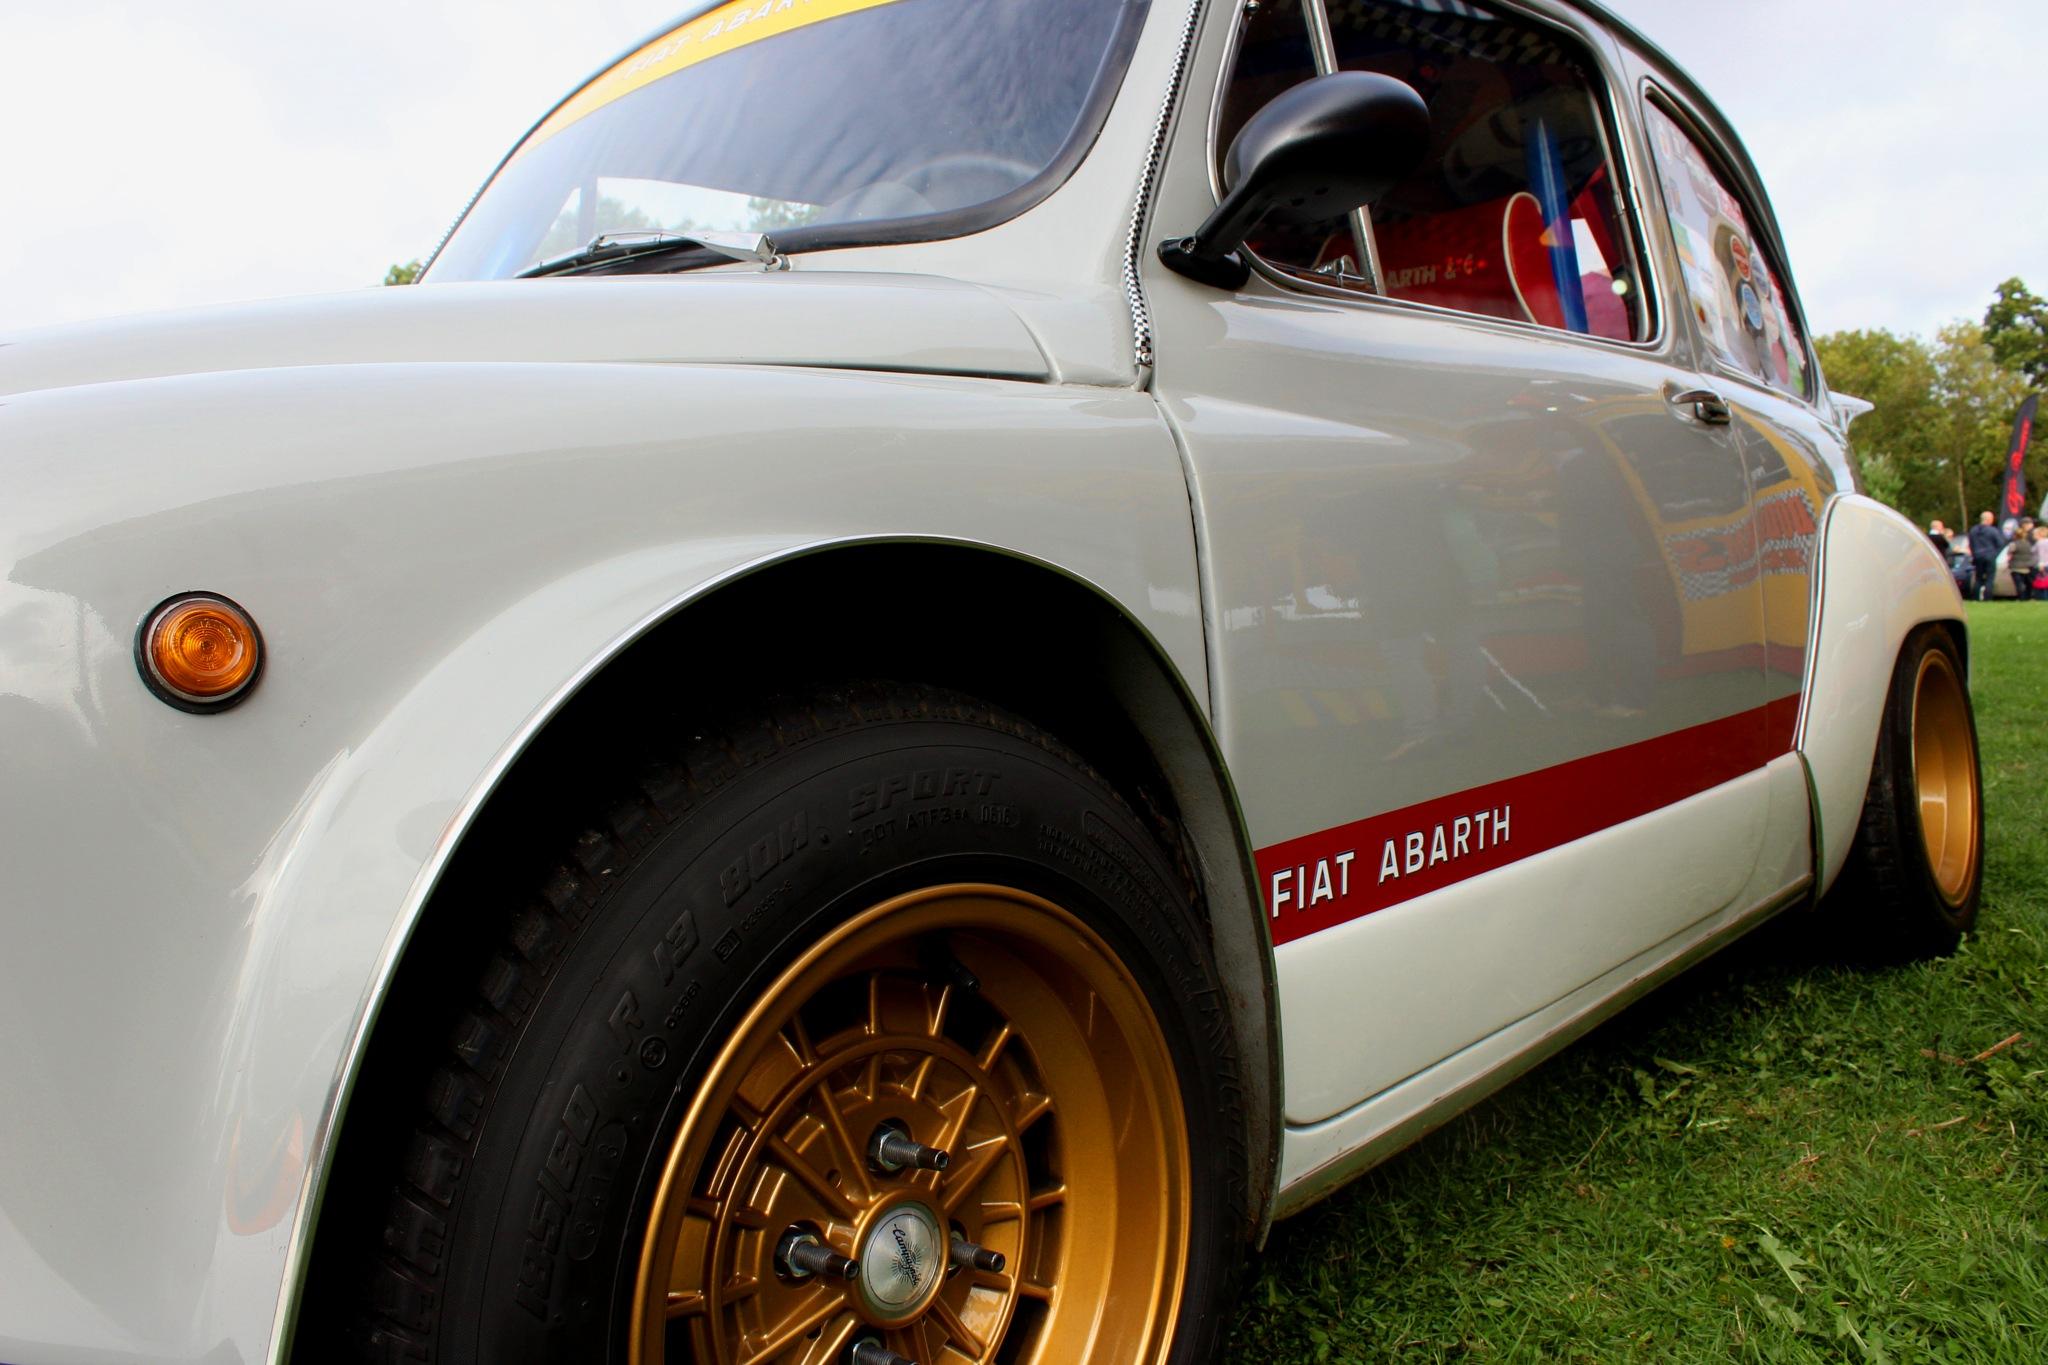 Fiat Abarth by MartinIngley